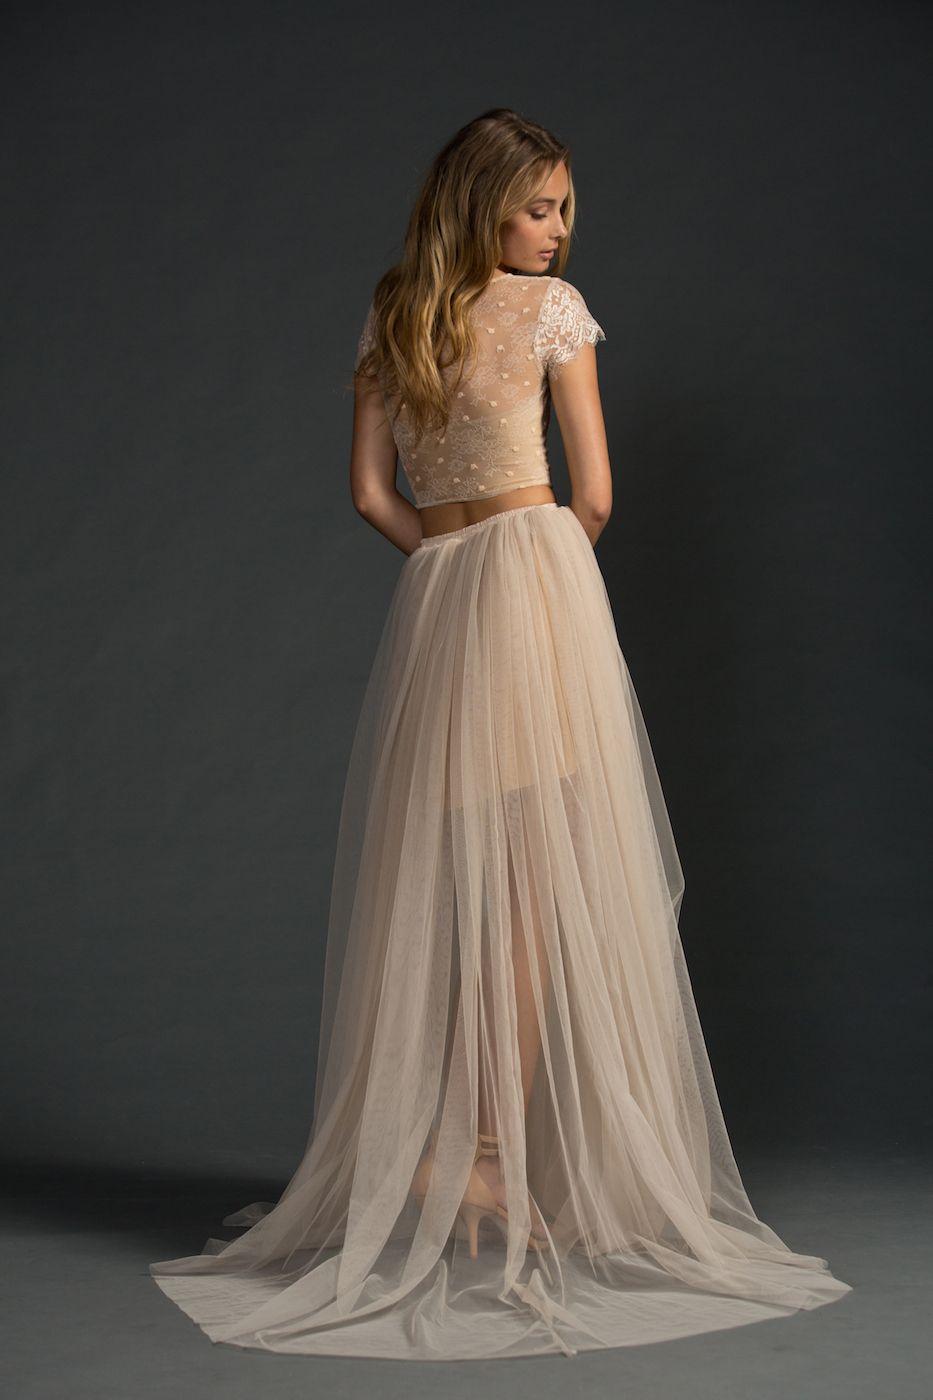 Atlanta wedding dress shops  Francesca  Whimsical Silhouettes and Romantic